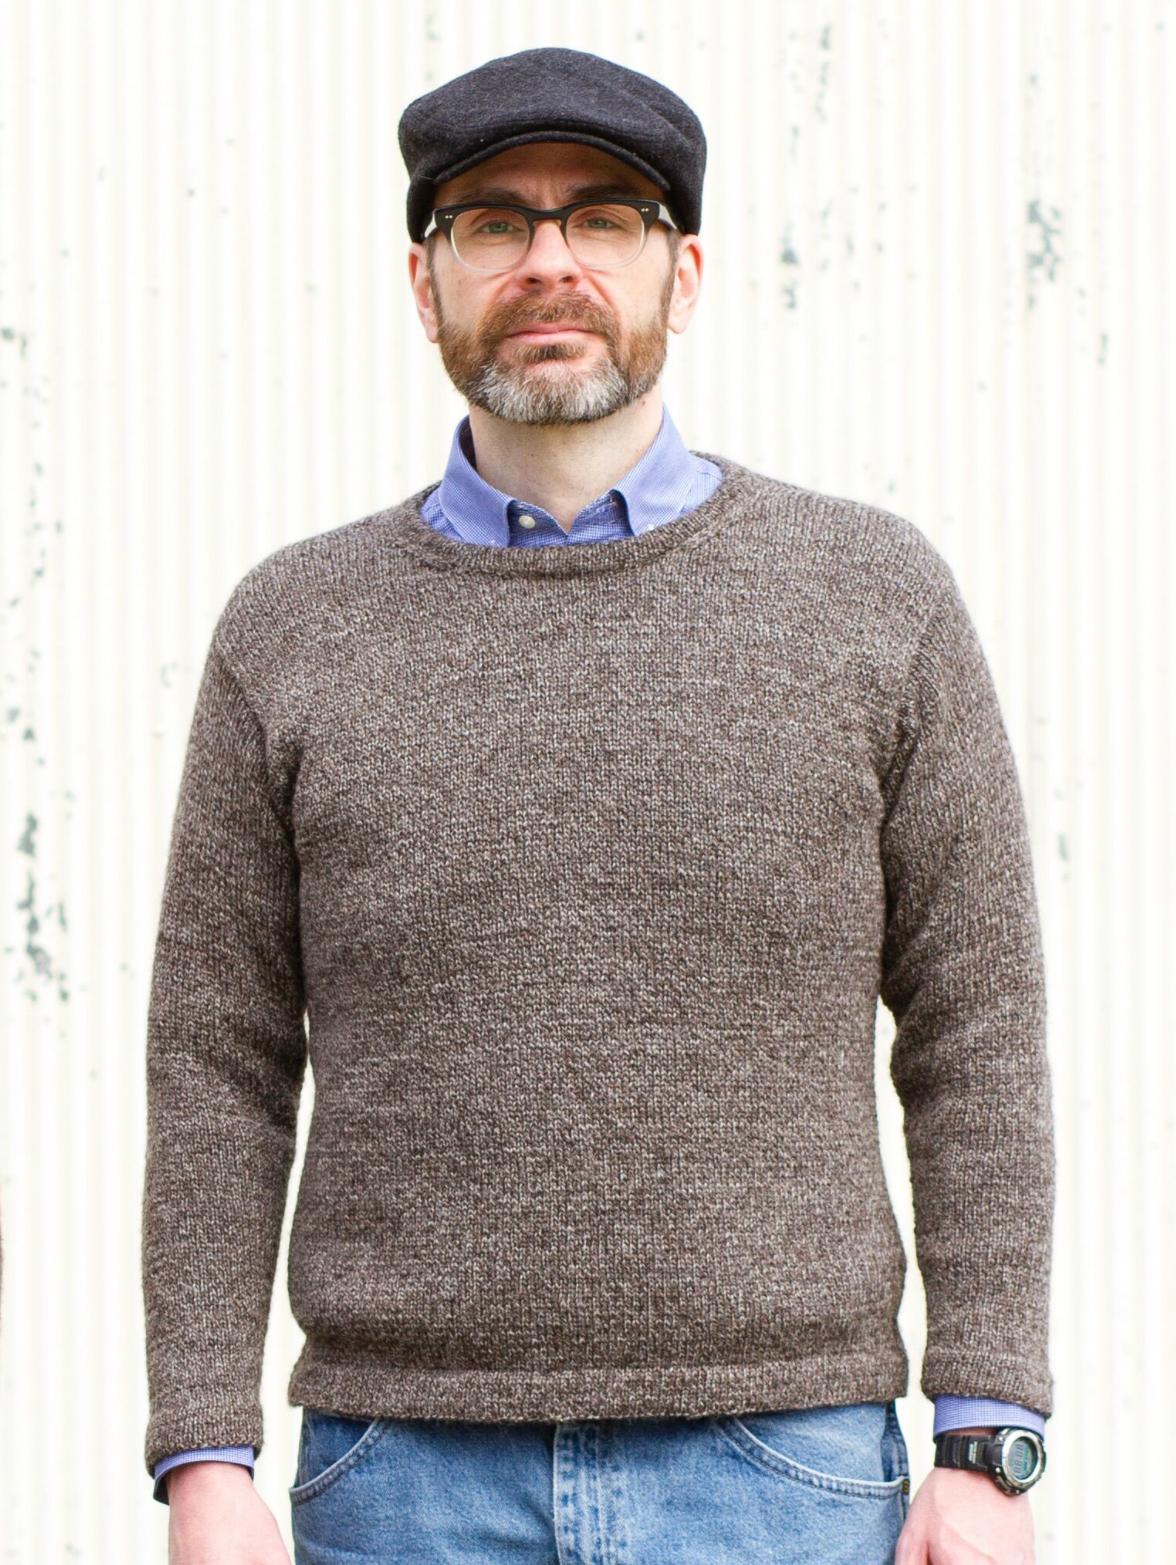 Stephen's woolly marled Abram sweater in Thirteen Mile yarn